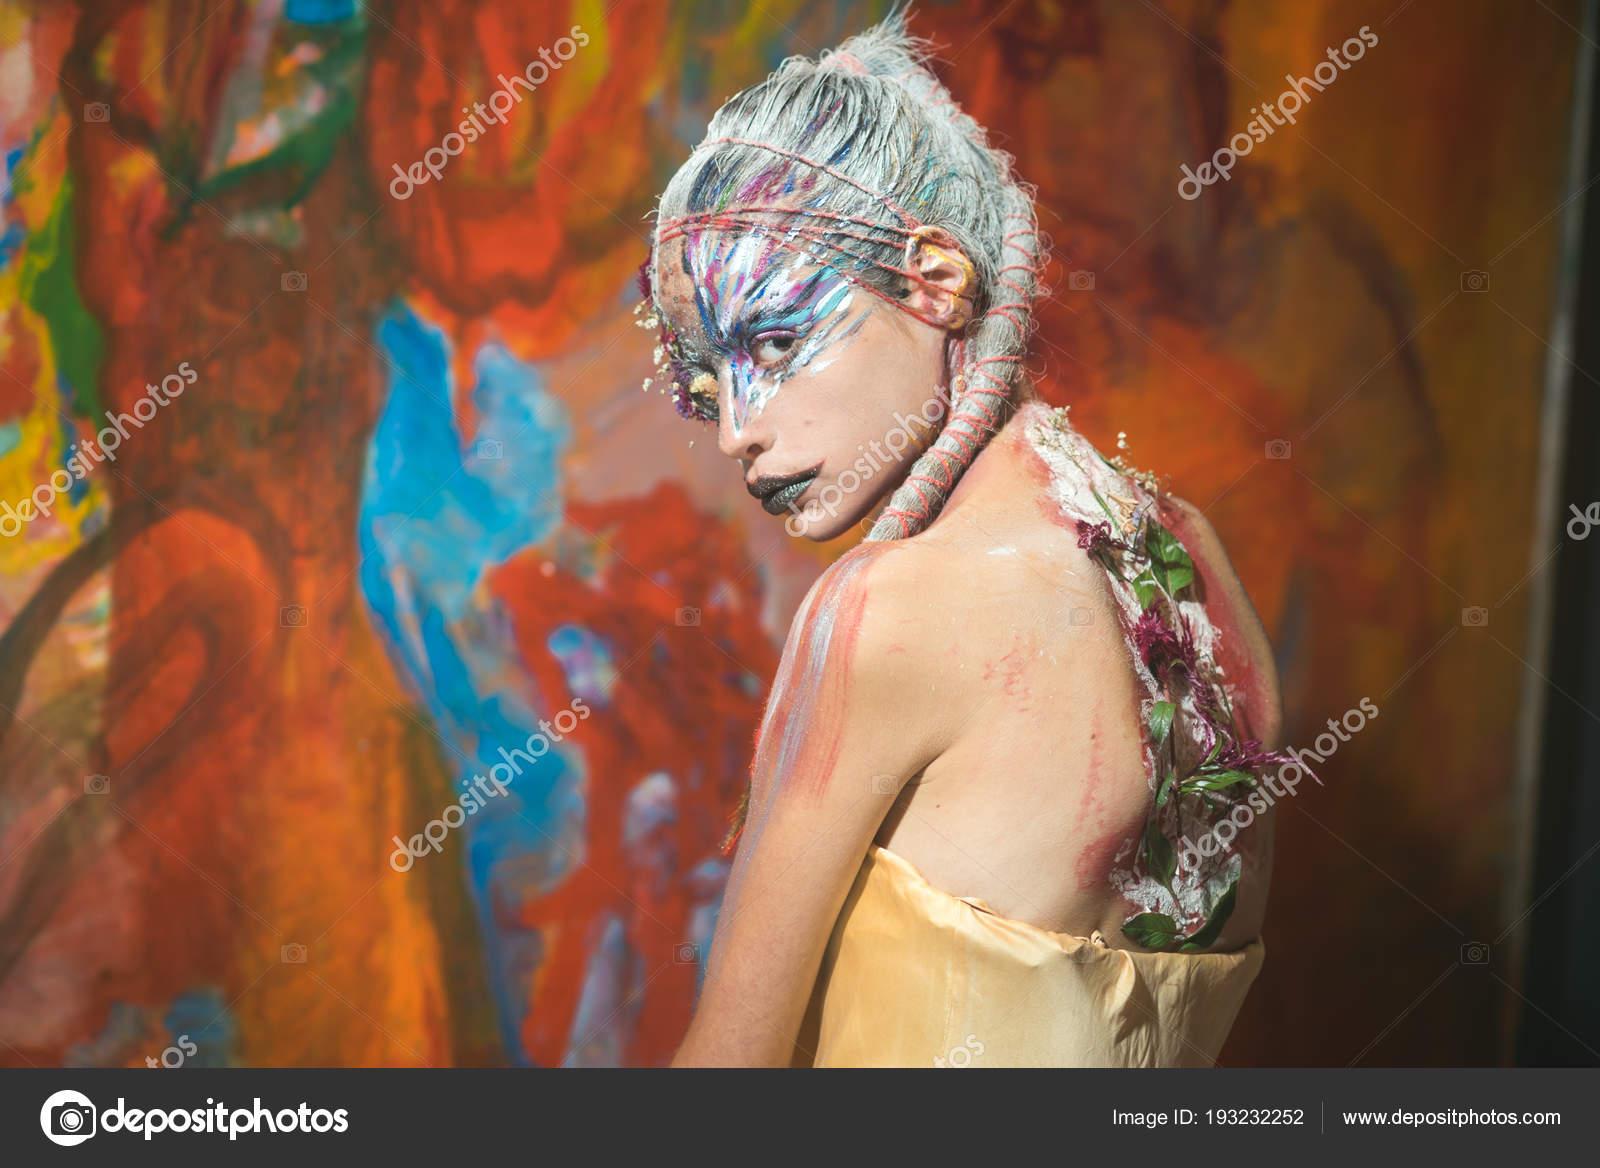 Indian Woman Art Image Indian Woman Creative Body Art